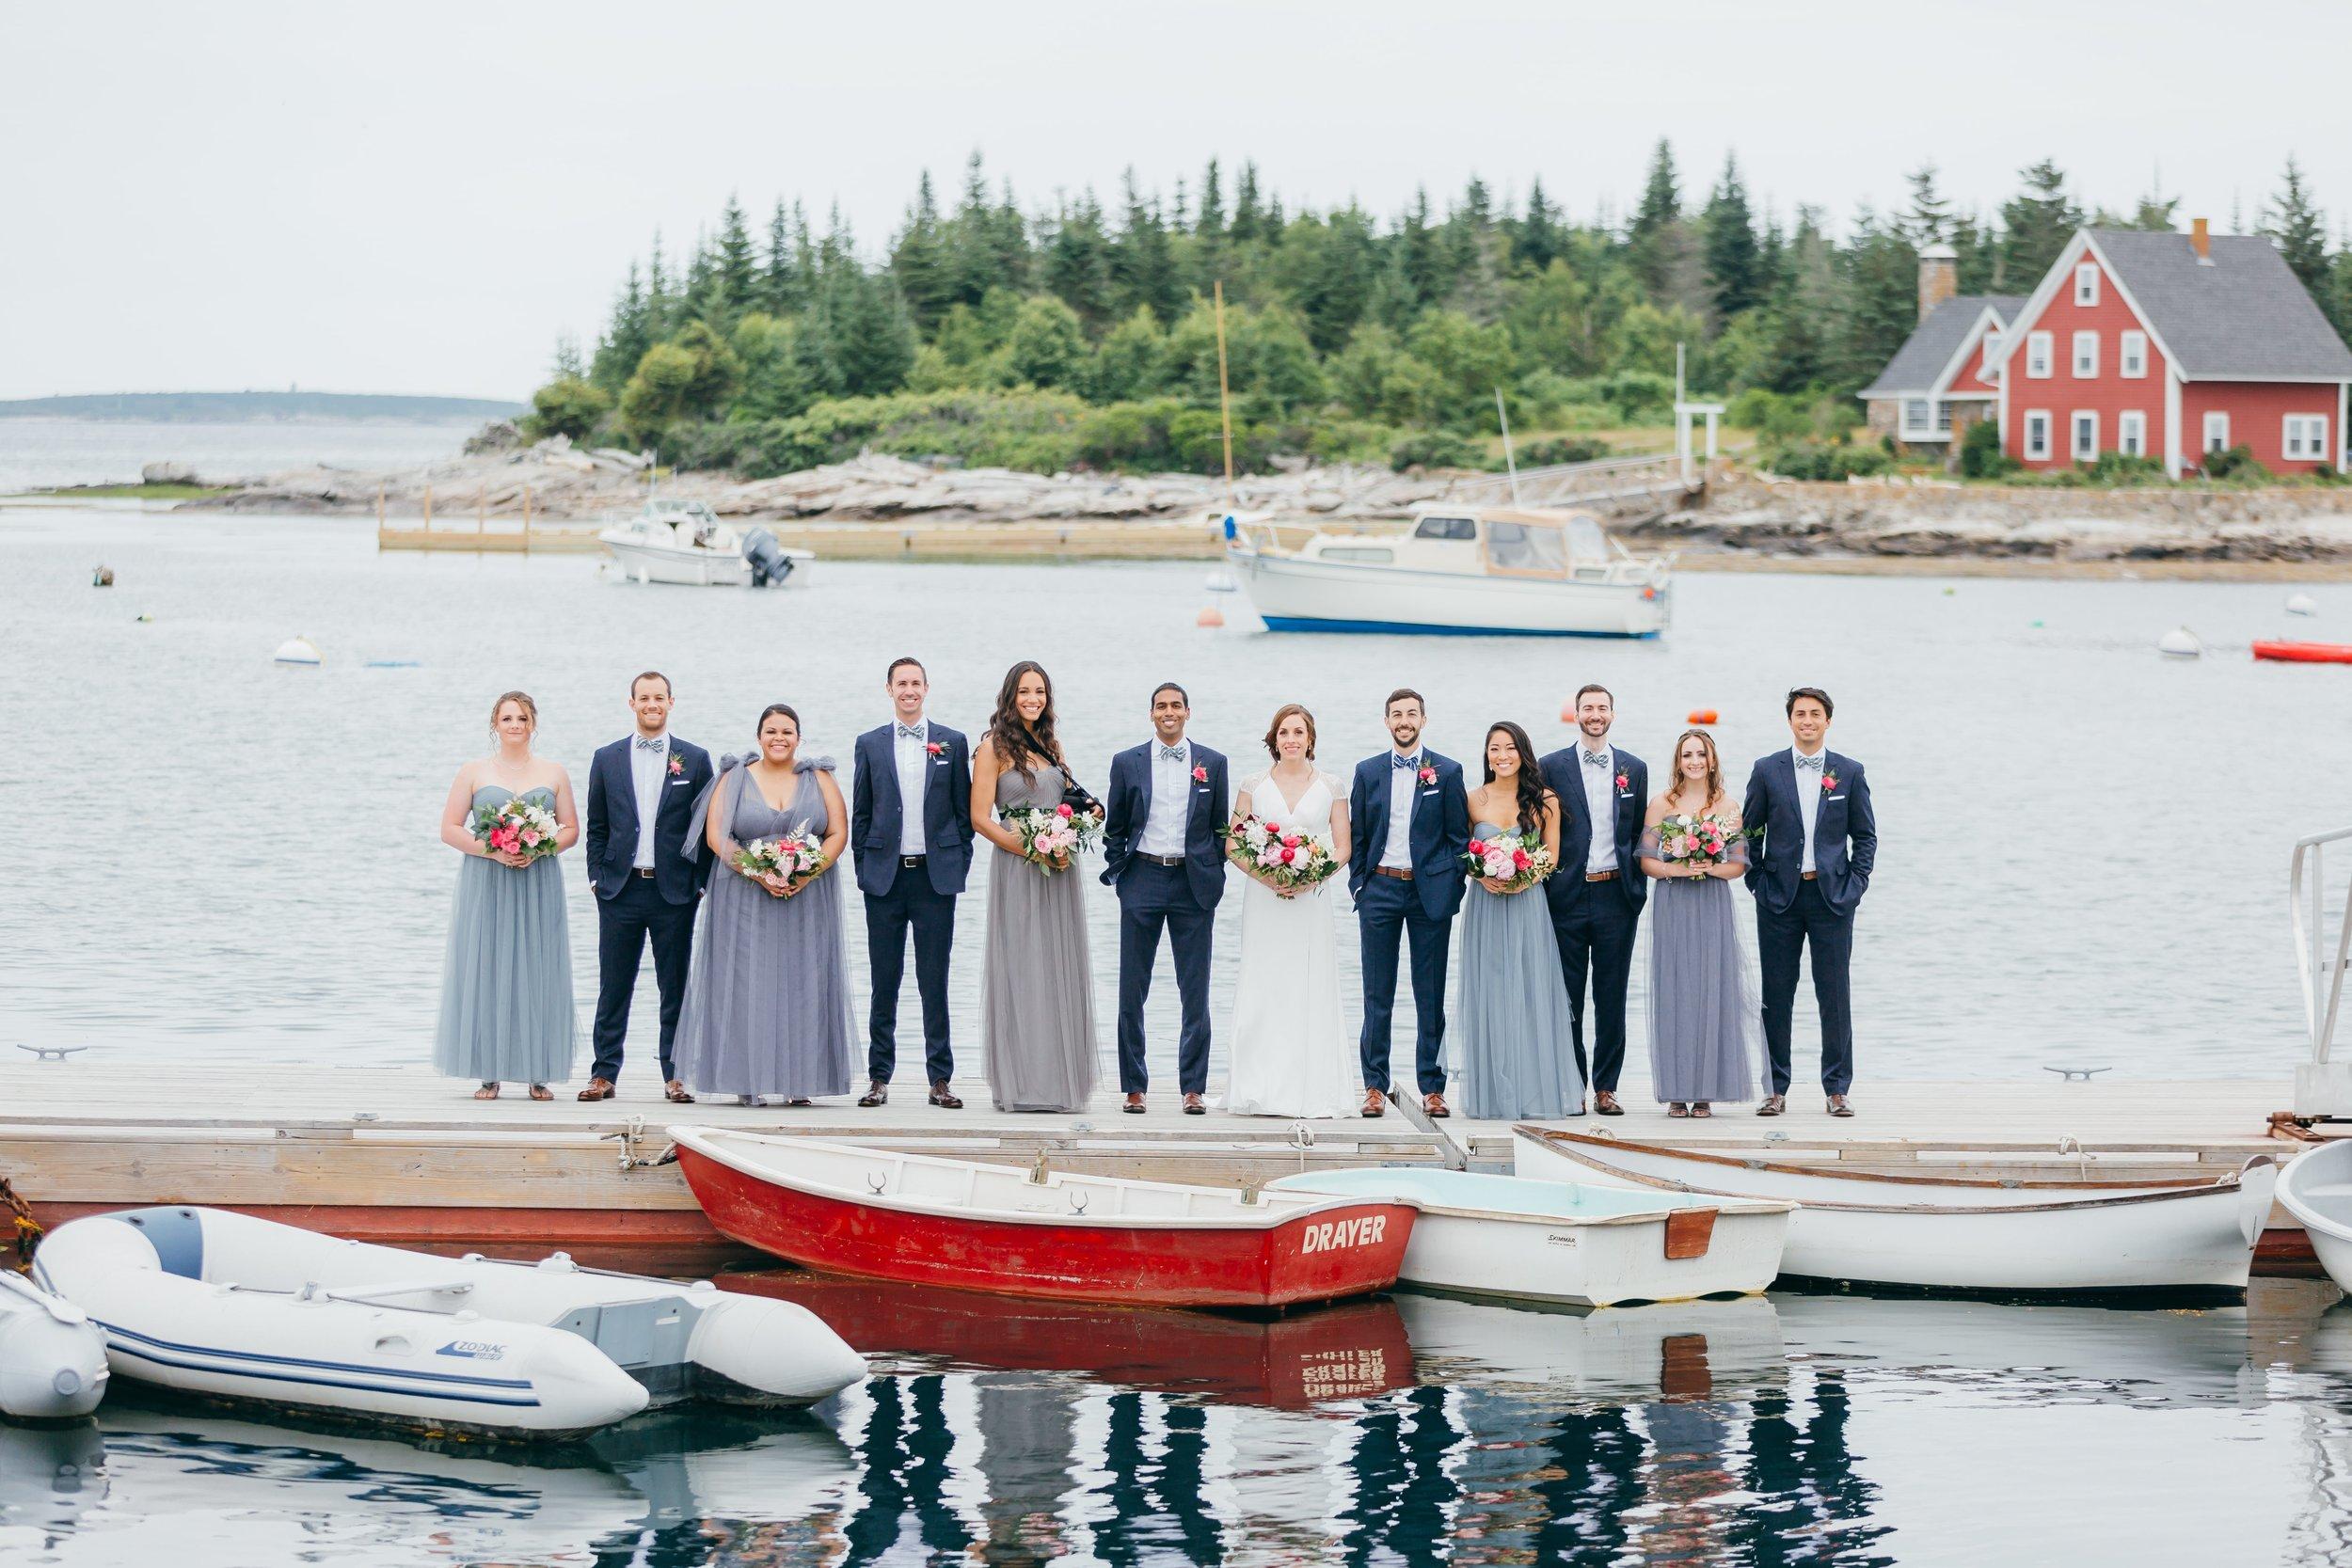 Mirian and John's wedding in Maine. Custom bow ties by Lindman